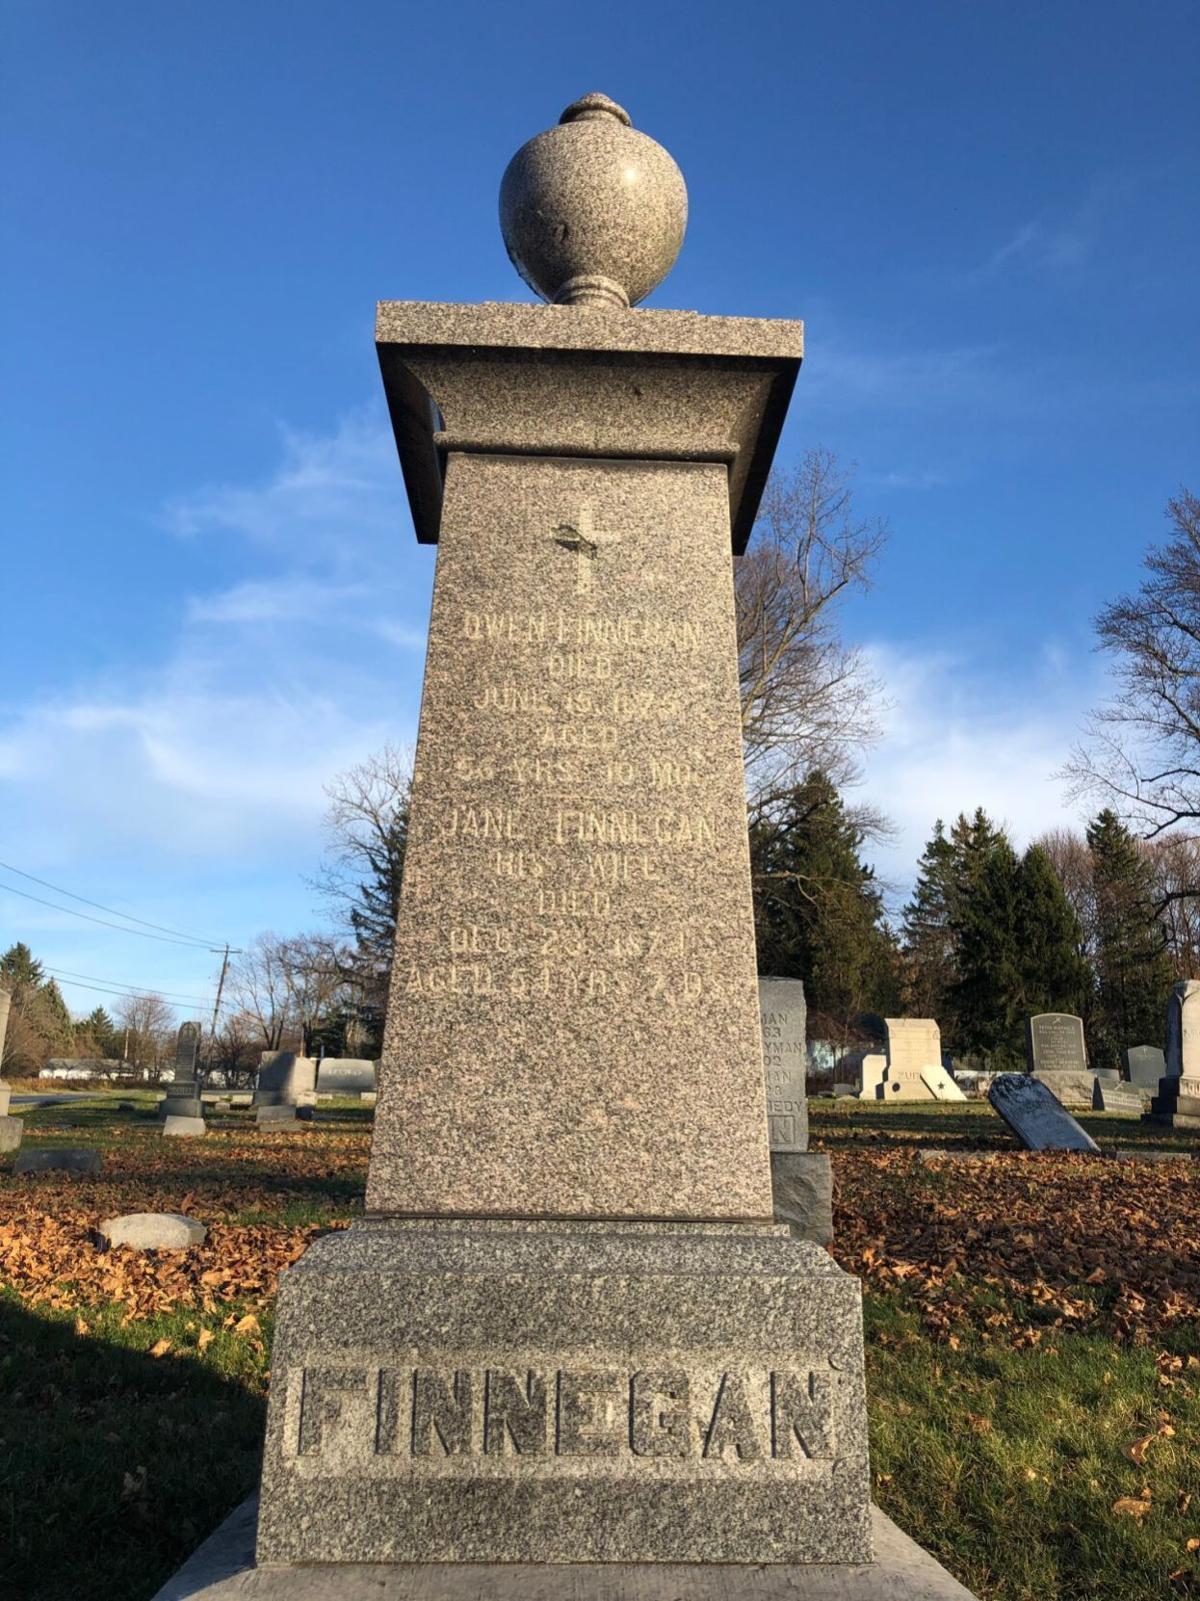 Finnegan monument